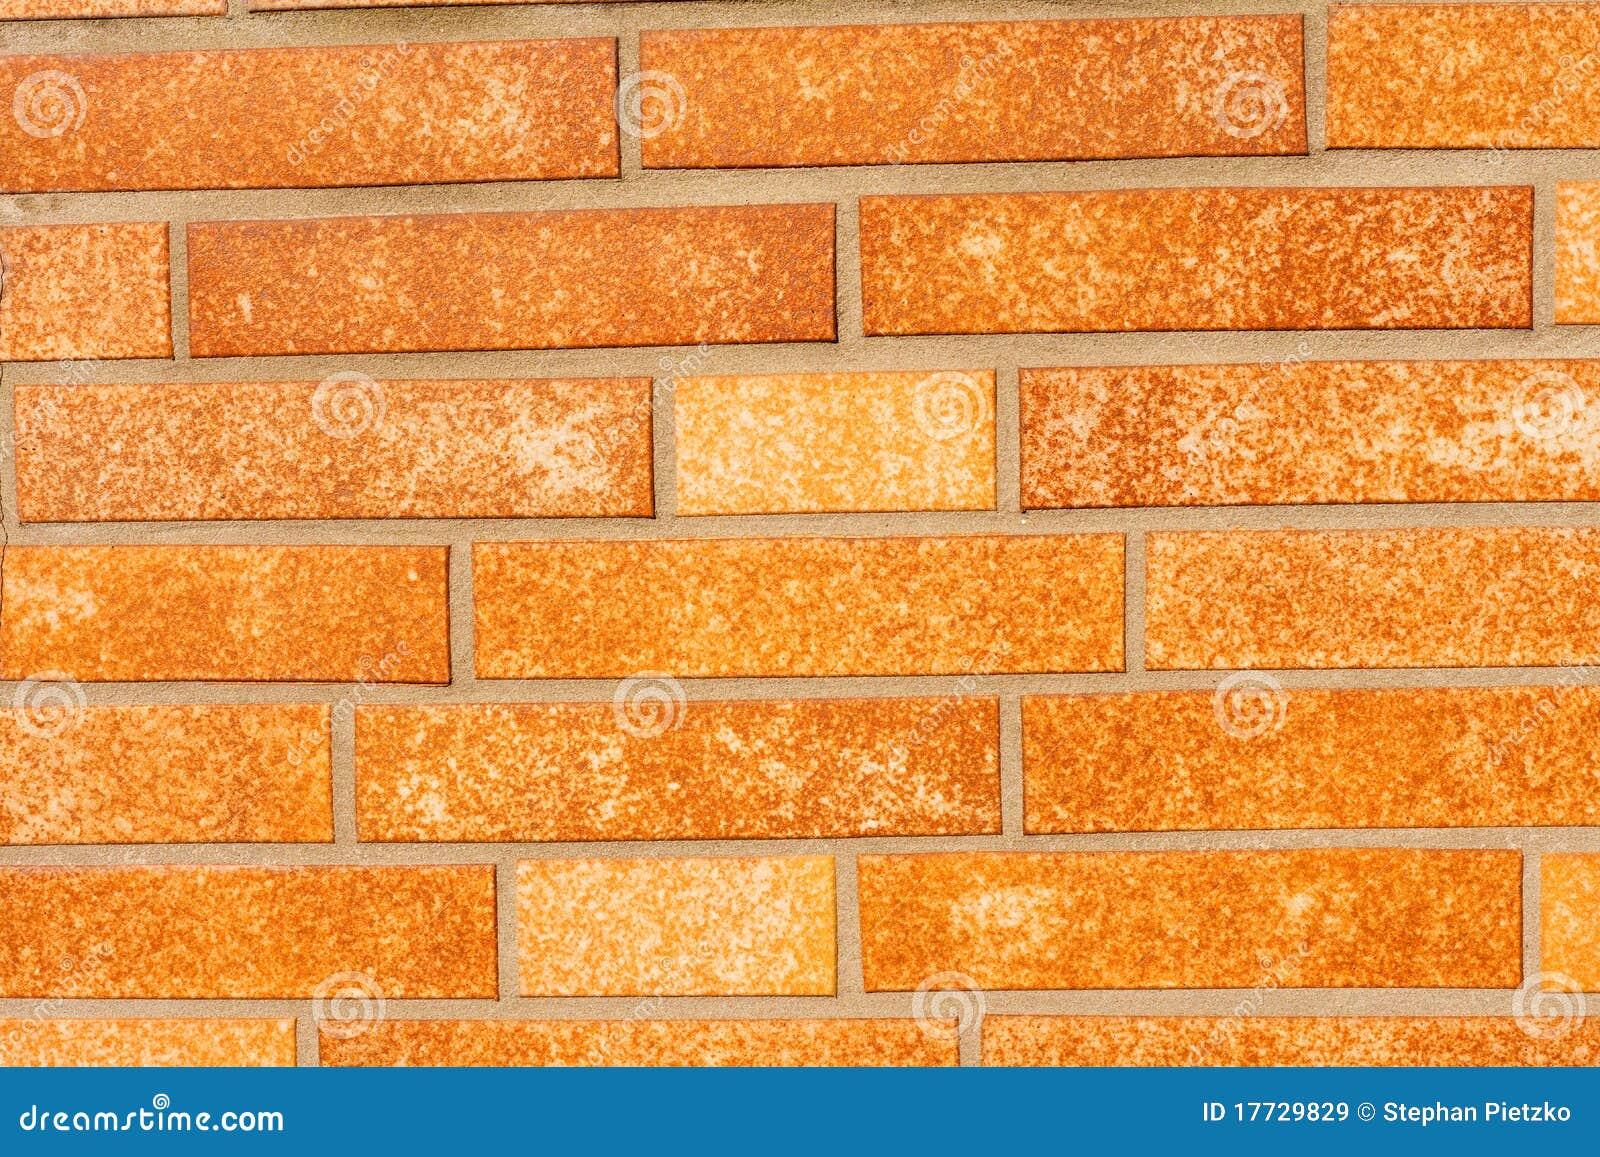 Fake Ocher Brick Wall Siding Royalty Free Stock Images Image 17729829